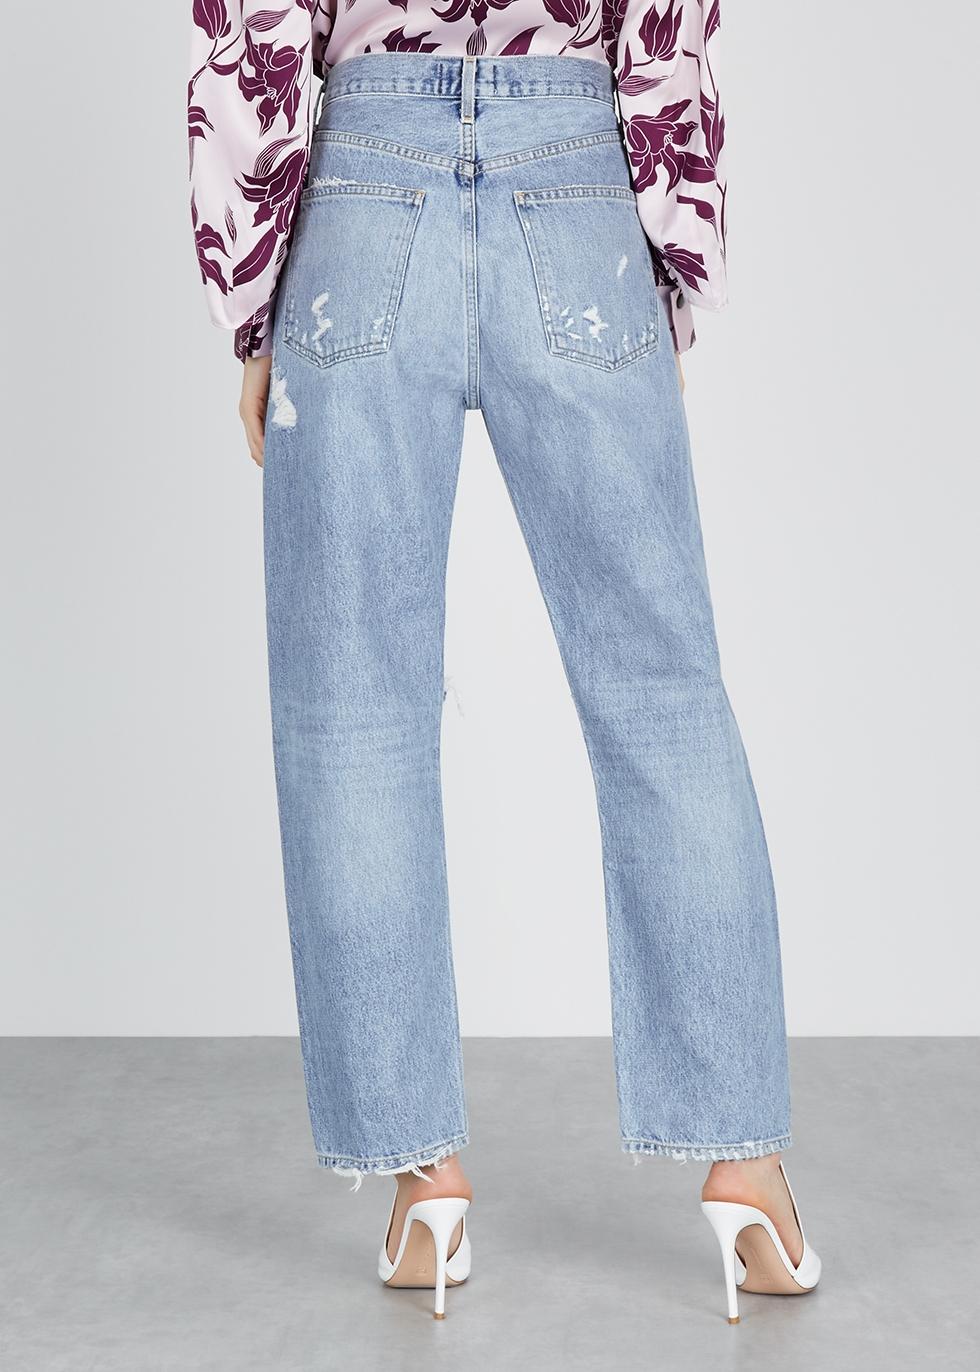 90's distressed boyfriend jeans - AGOLDE